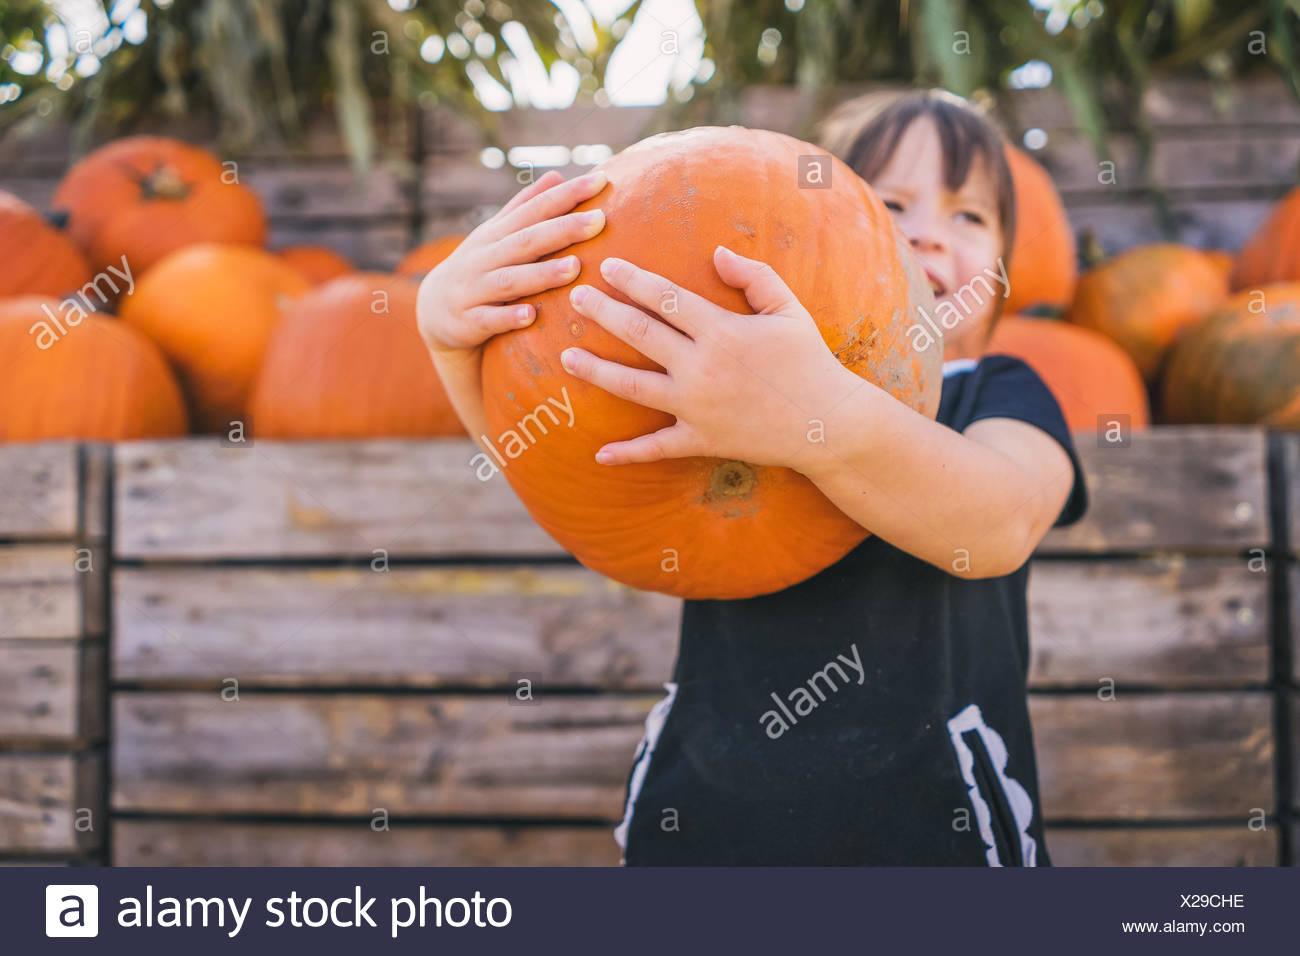 Girl holding large pumpkin at pumpkin farm - Stock Image